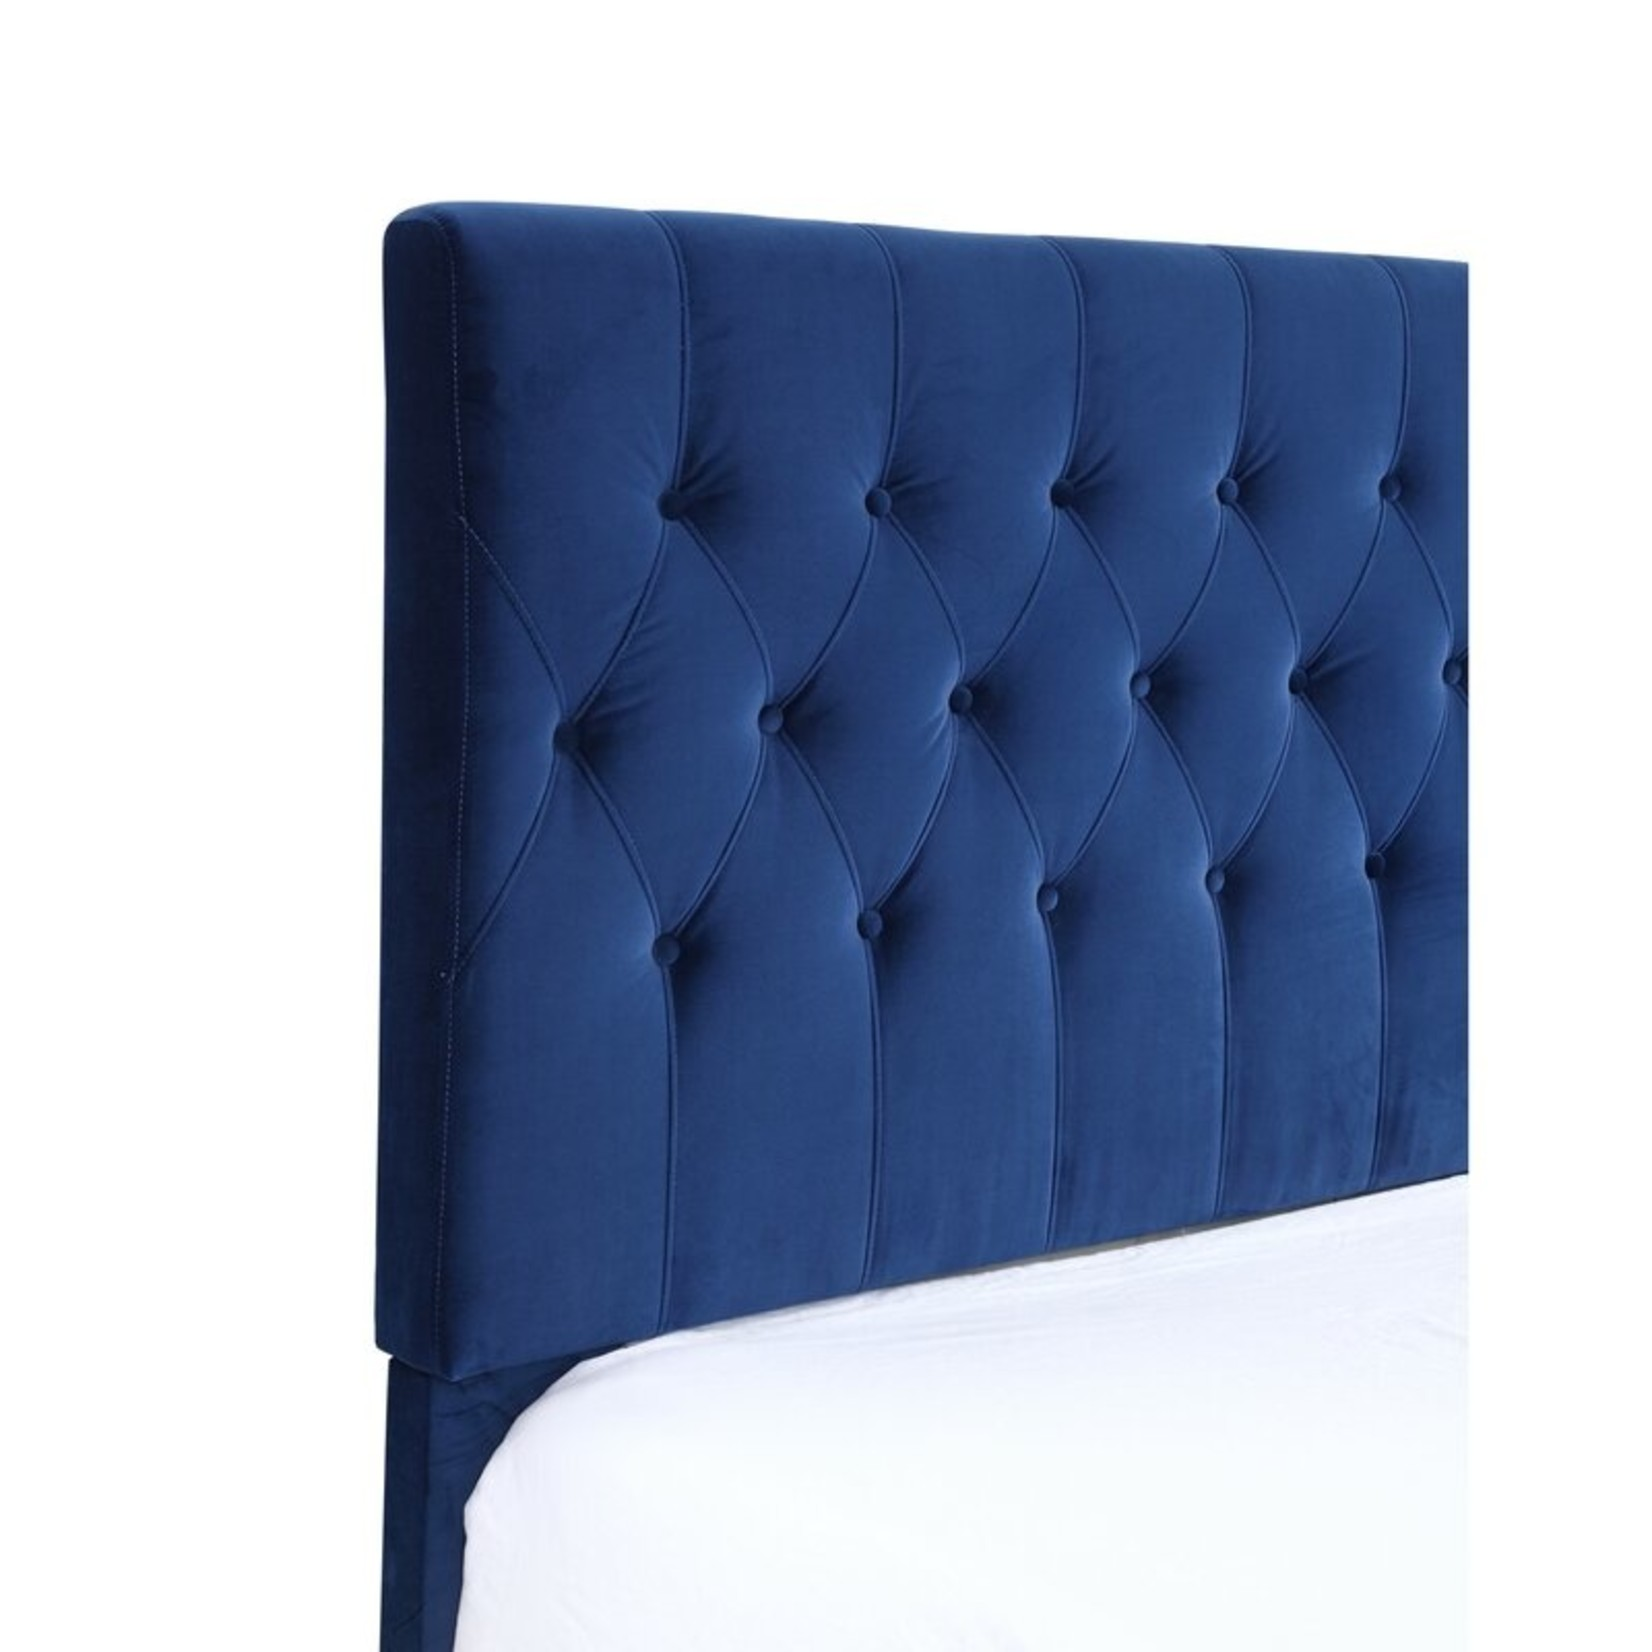 *Full - Kayden Tufted Upholstered Headboard - Navy